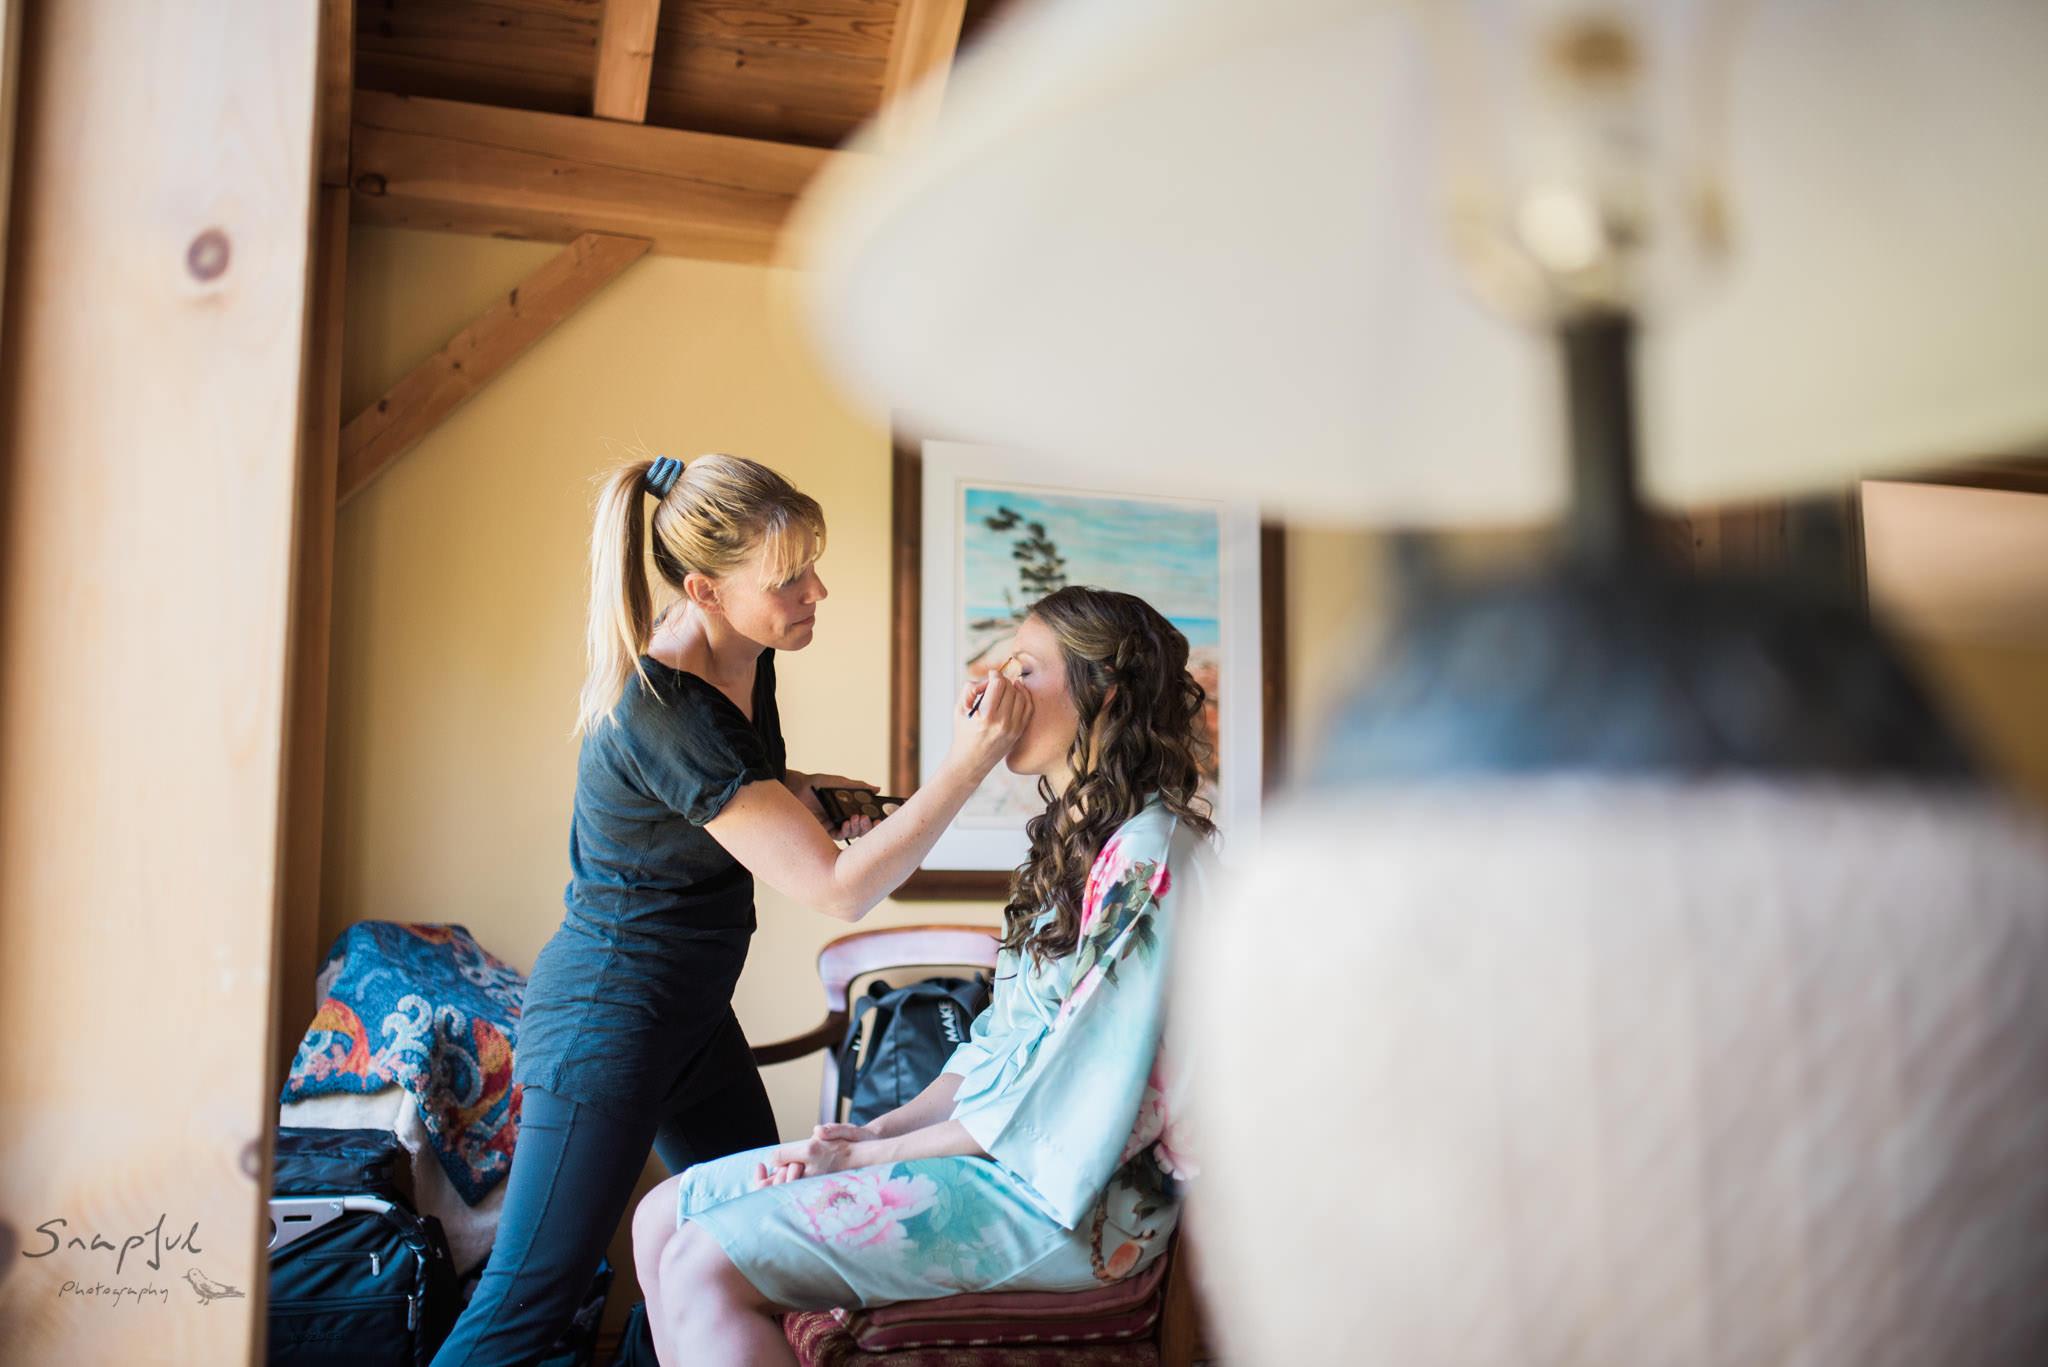 Makeup artist working on bride